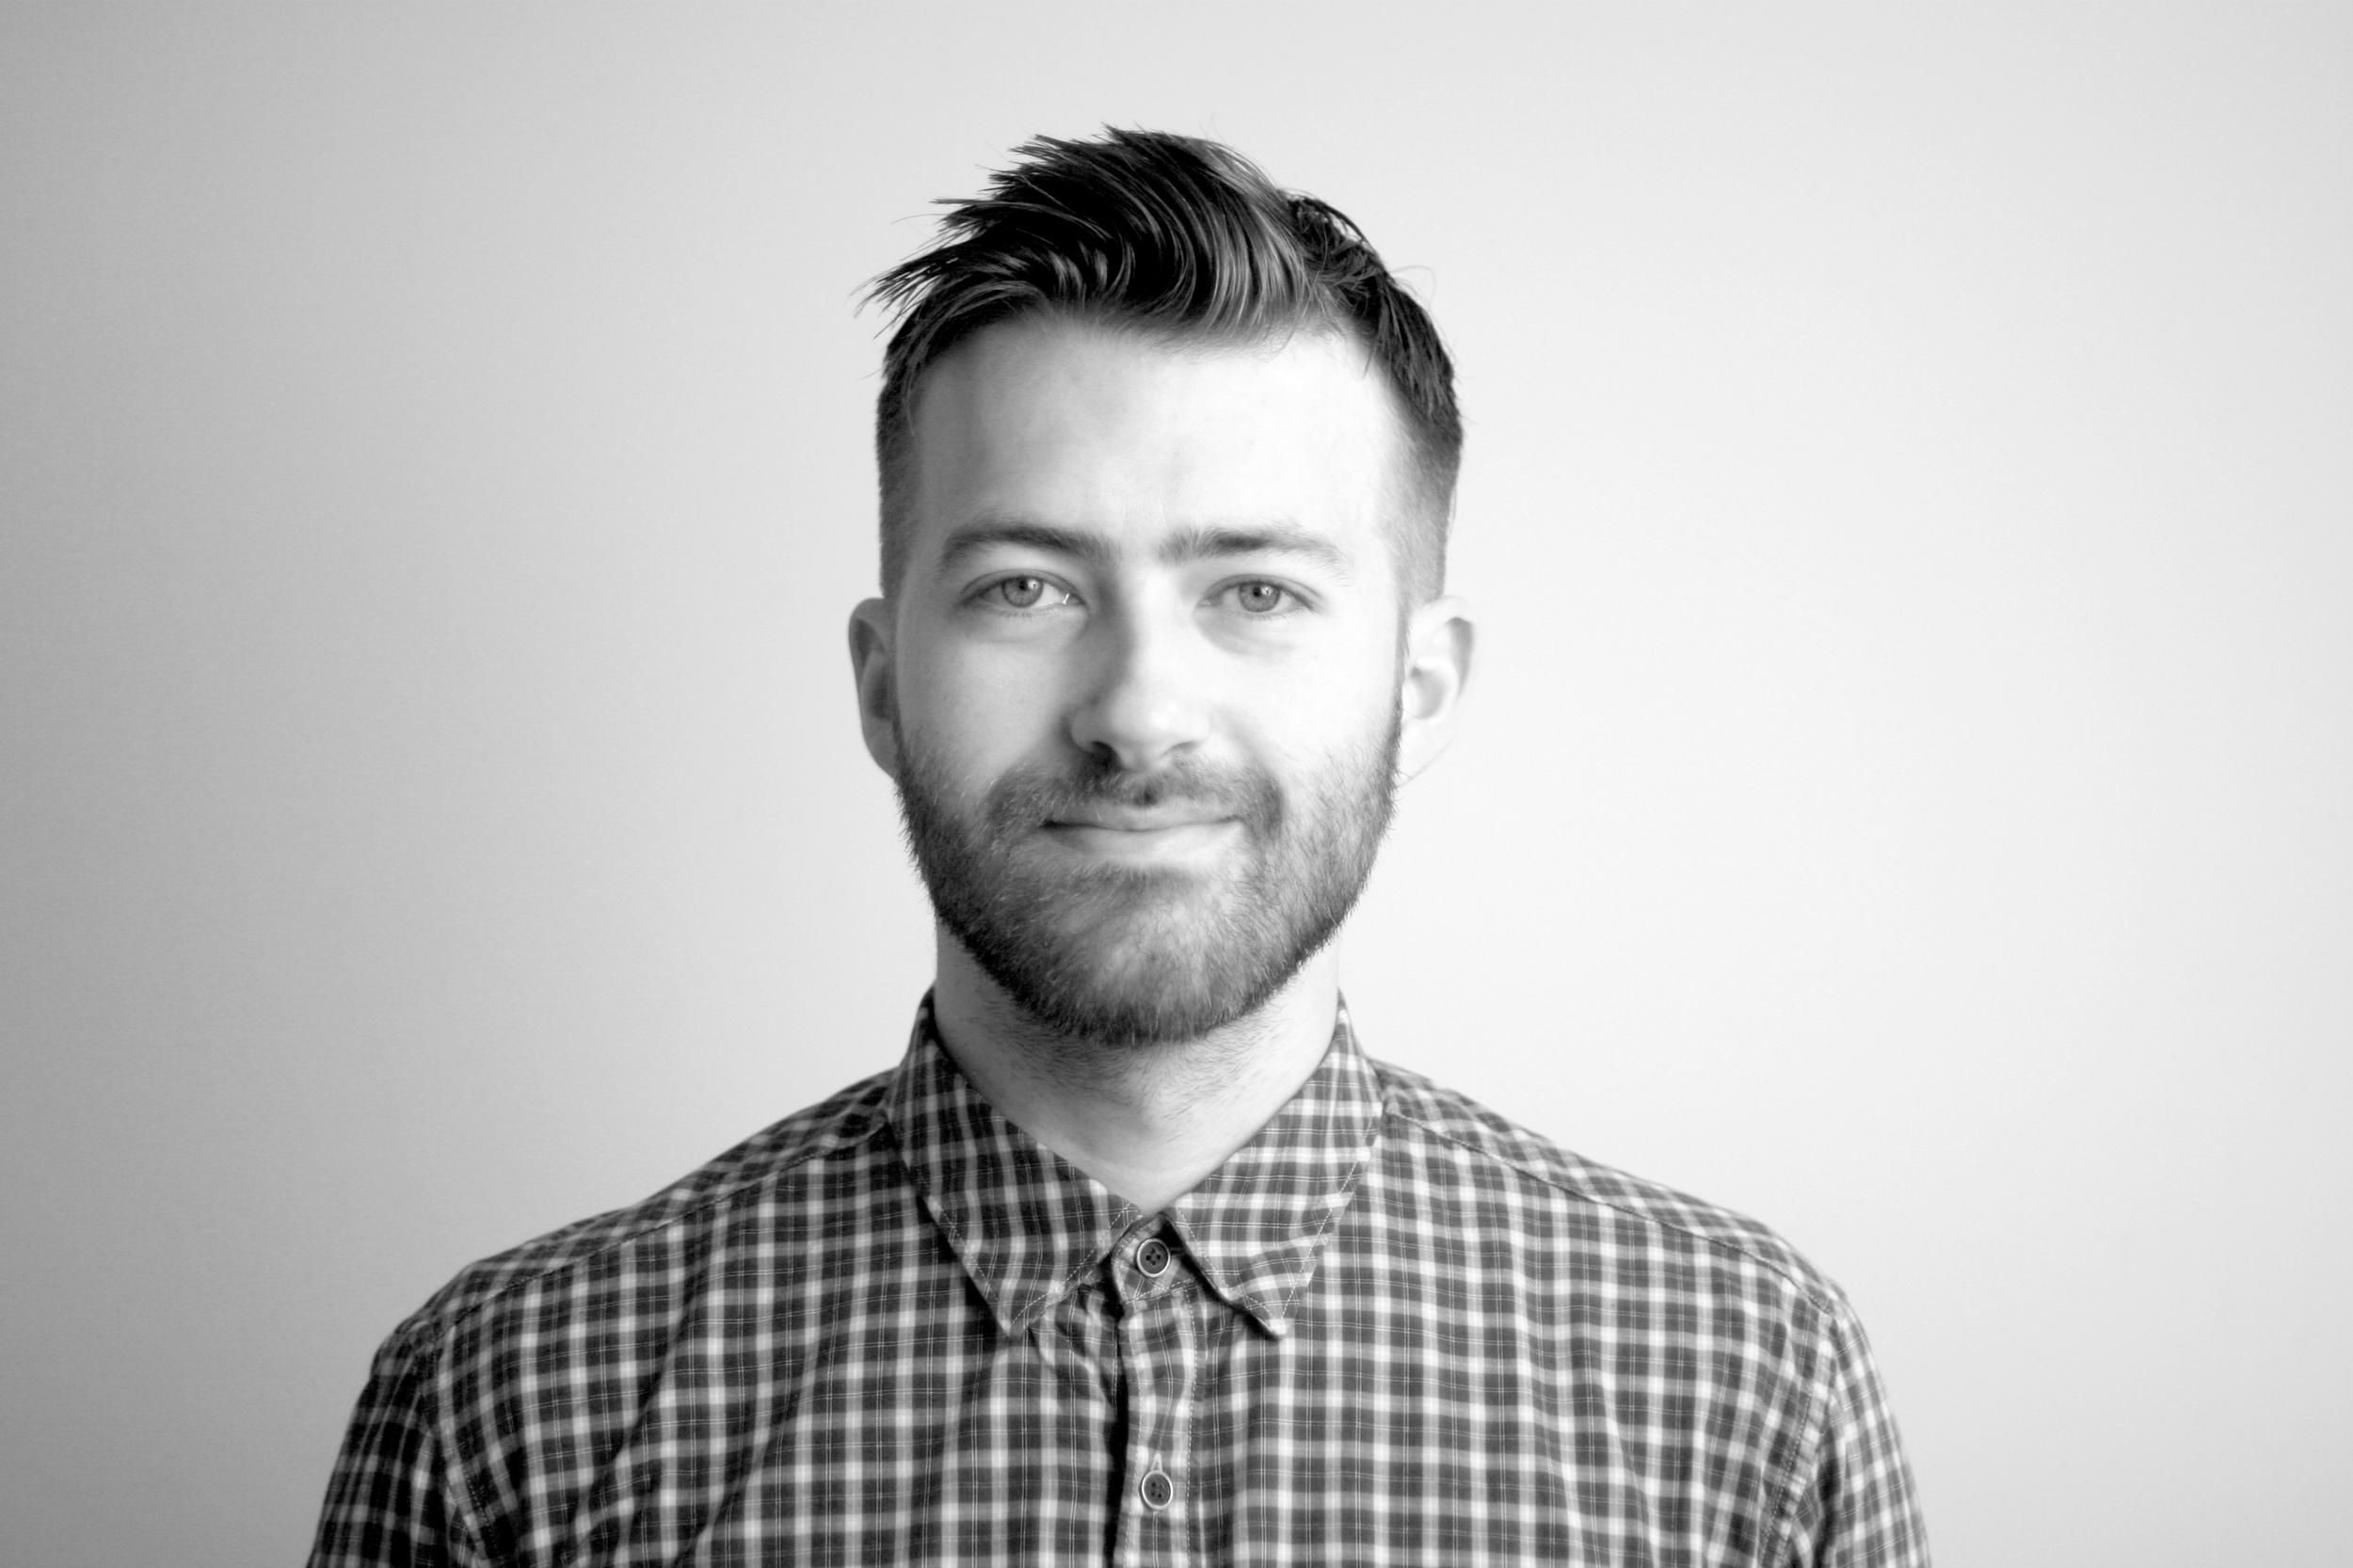 Christoffer Gotfredsen  Architect, M.Arch  cg@effekt.dk